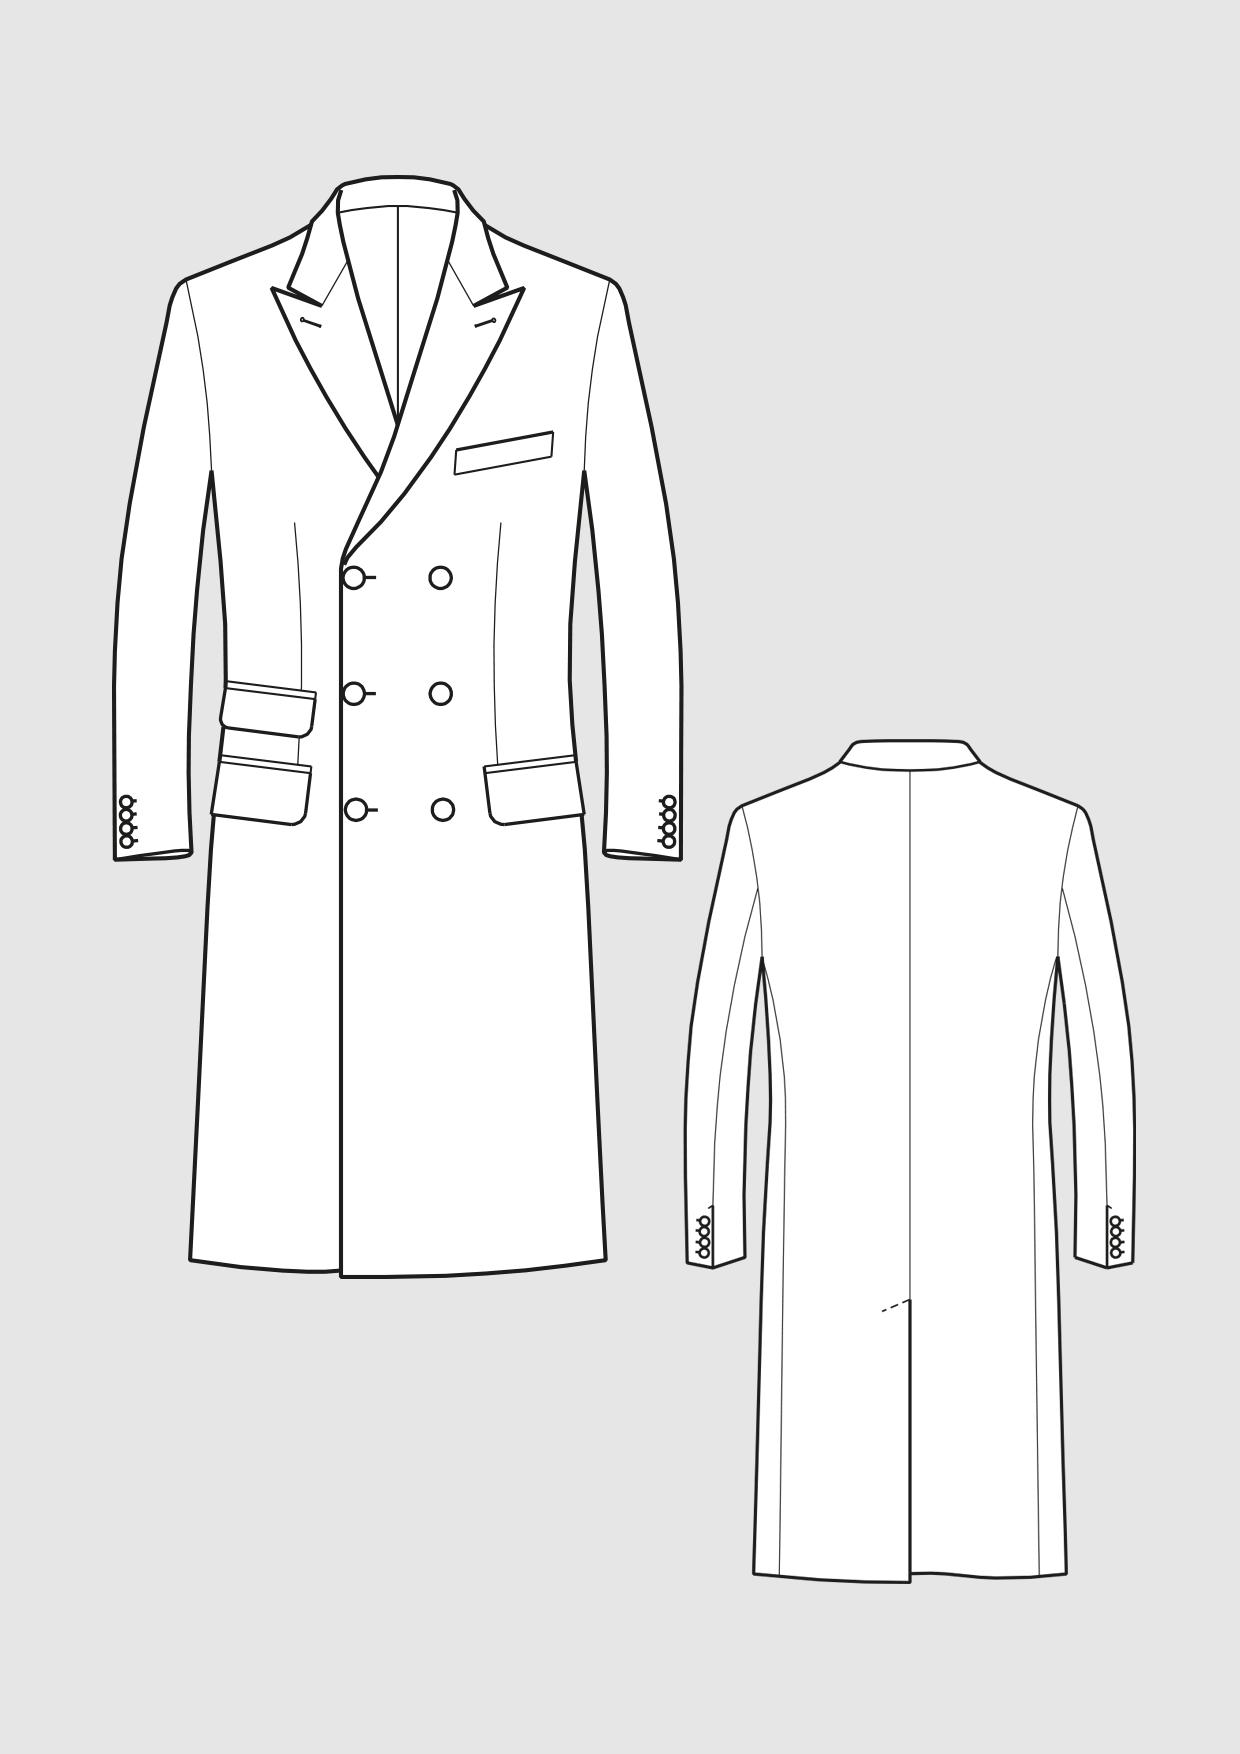 Produkt: Schnittmuster Paletot-Mantel für Herren